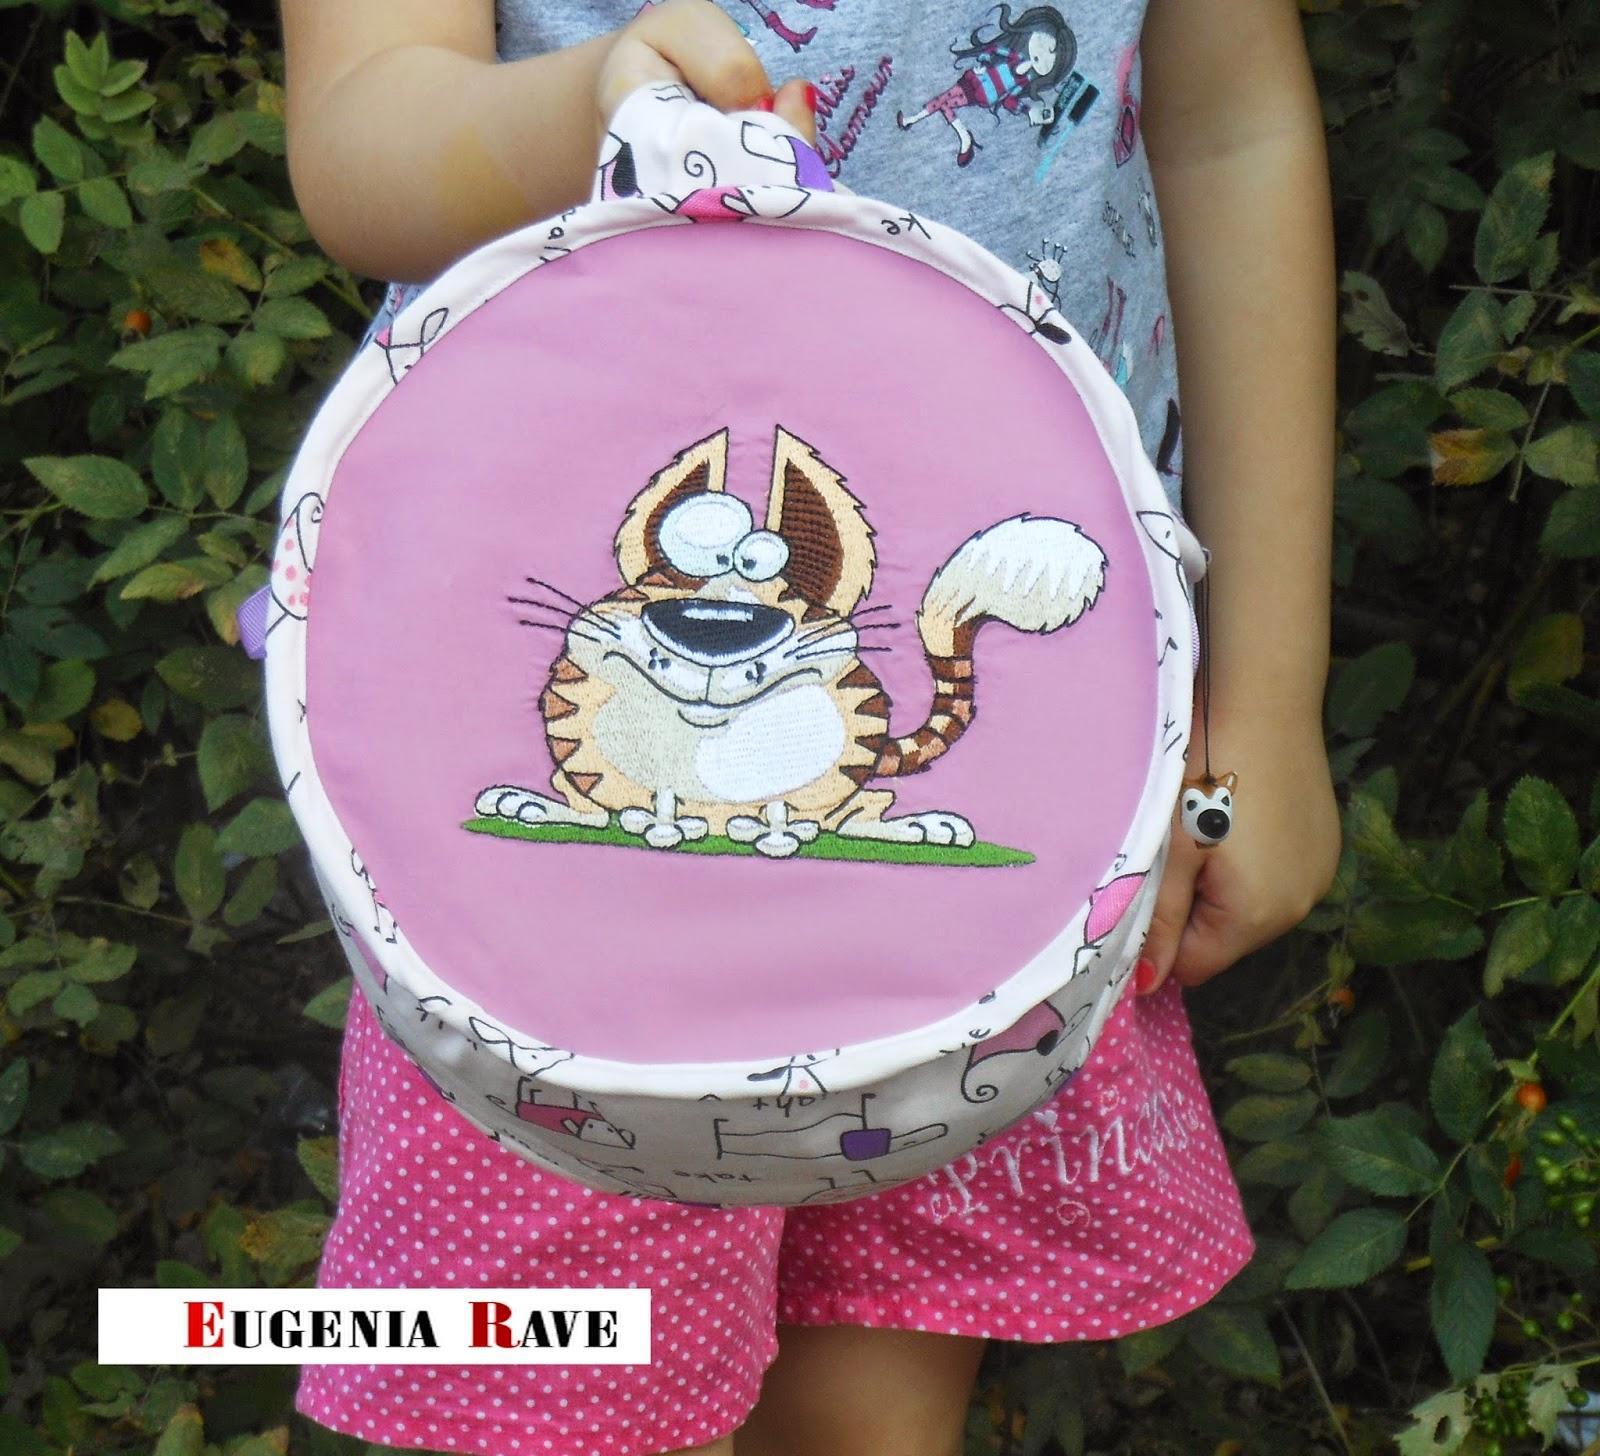 детская сумочка, сумка на самокат, круглая сумка, сумочка для детей